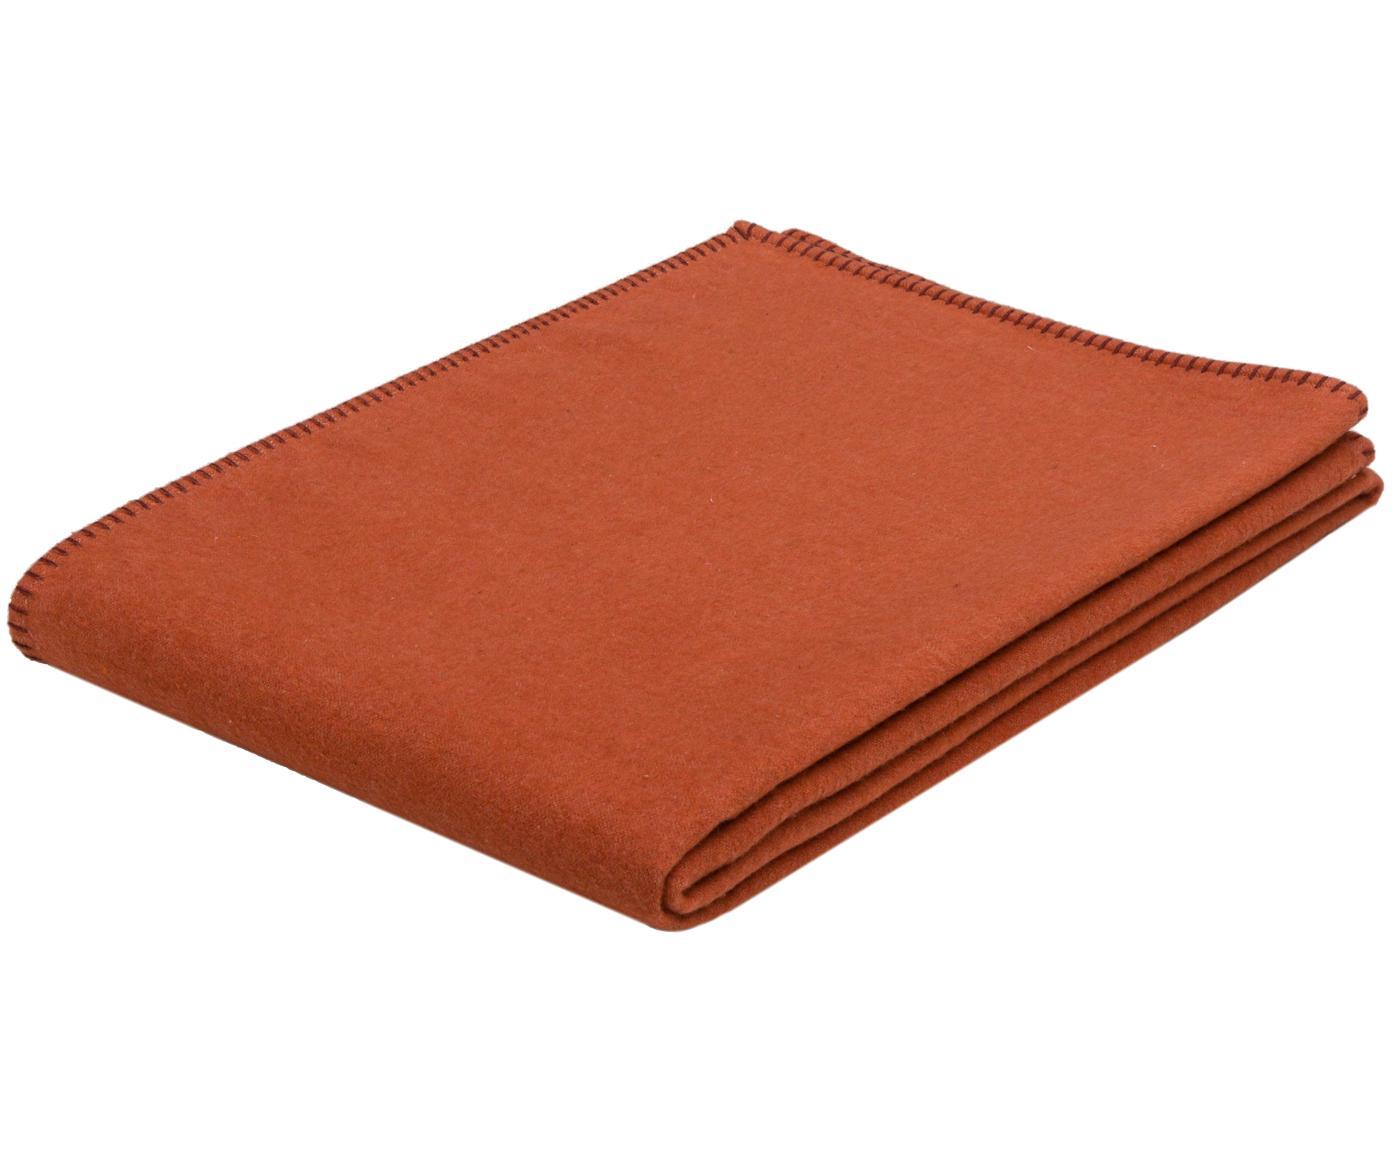 Fleece-Plaid Sylt, Webart: Jacquard, Orange, 140 x 200 cm